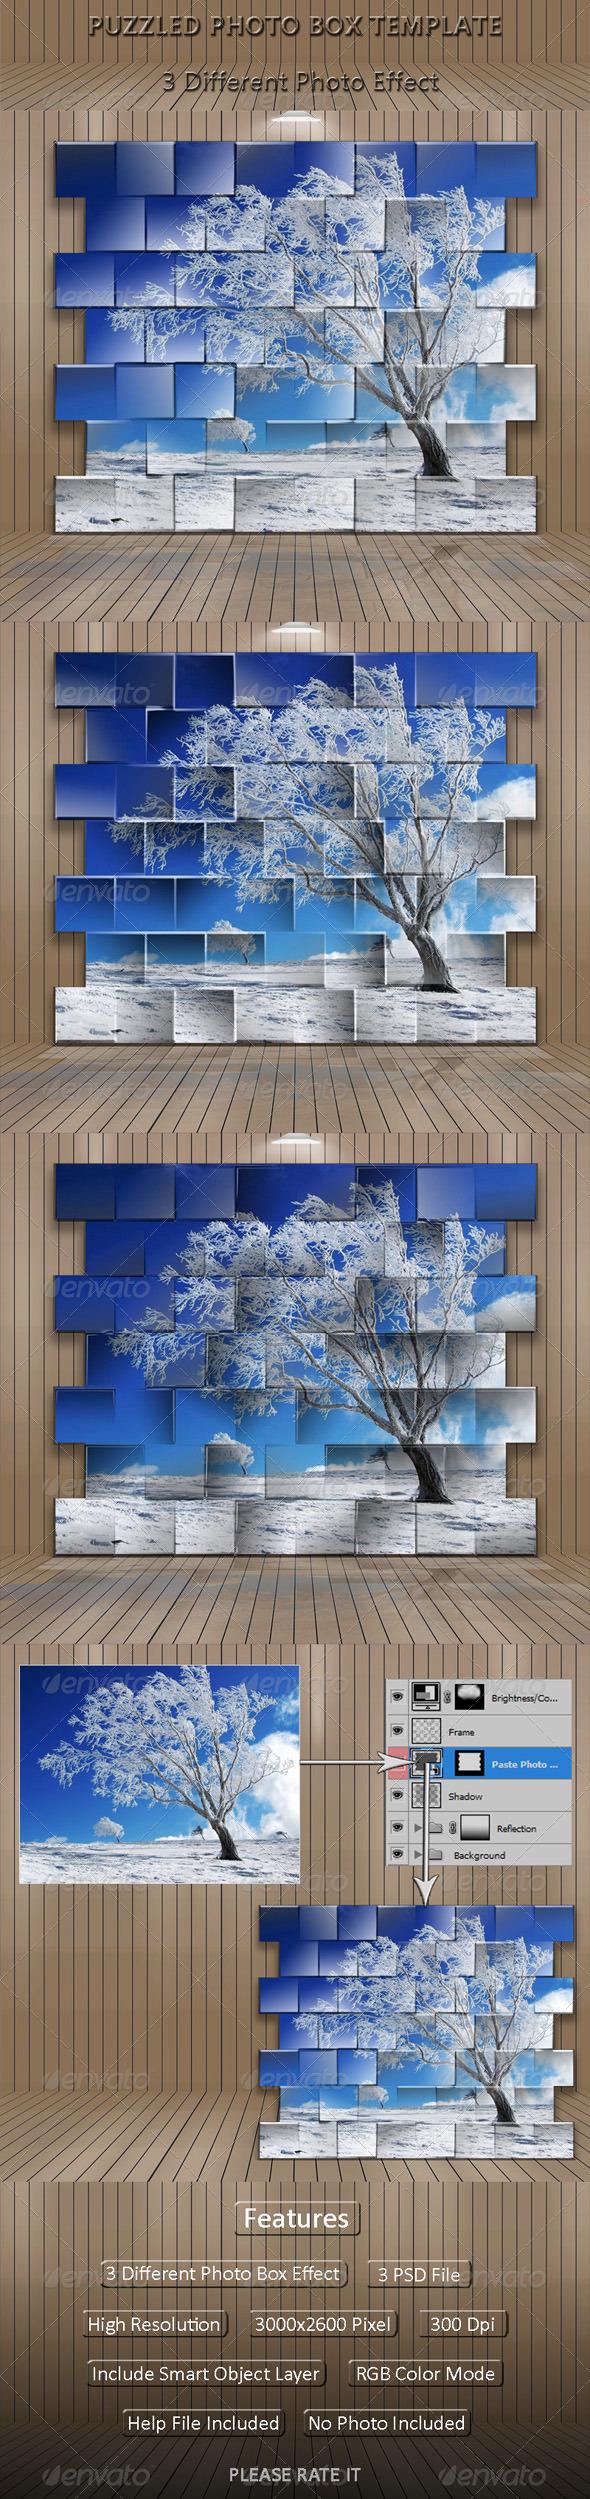 GraphicRiver Puzzled Photo Box Template 5032701